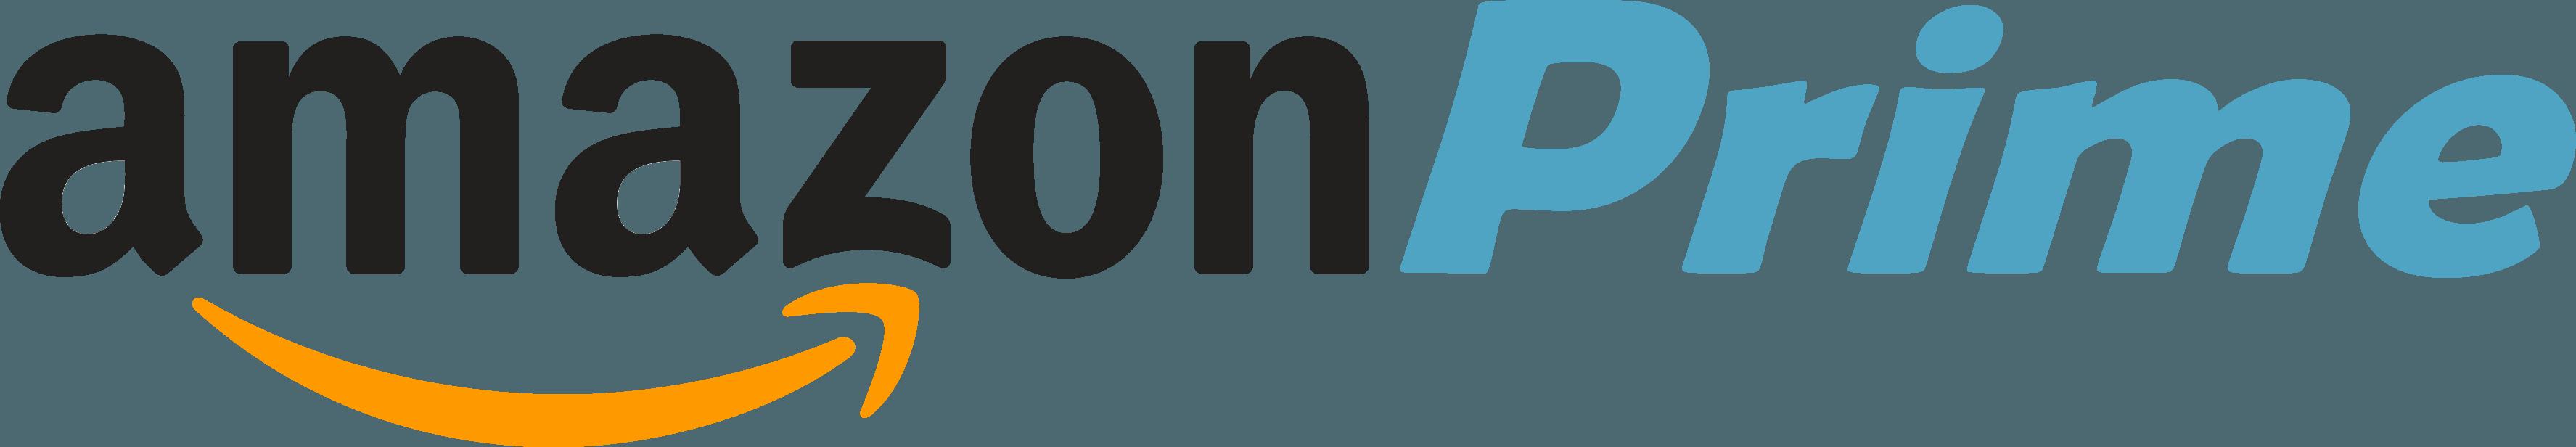 2017 – Omnixie WiFi Nixie Clocks, Educational Kits - Amazon Prime Logo Transparent